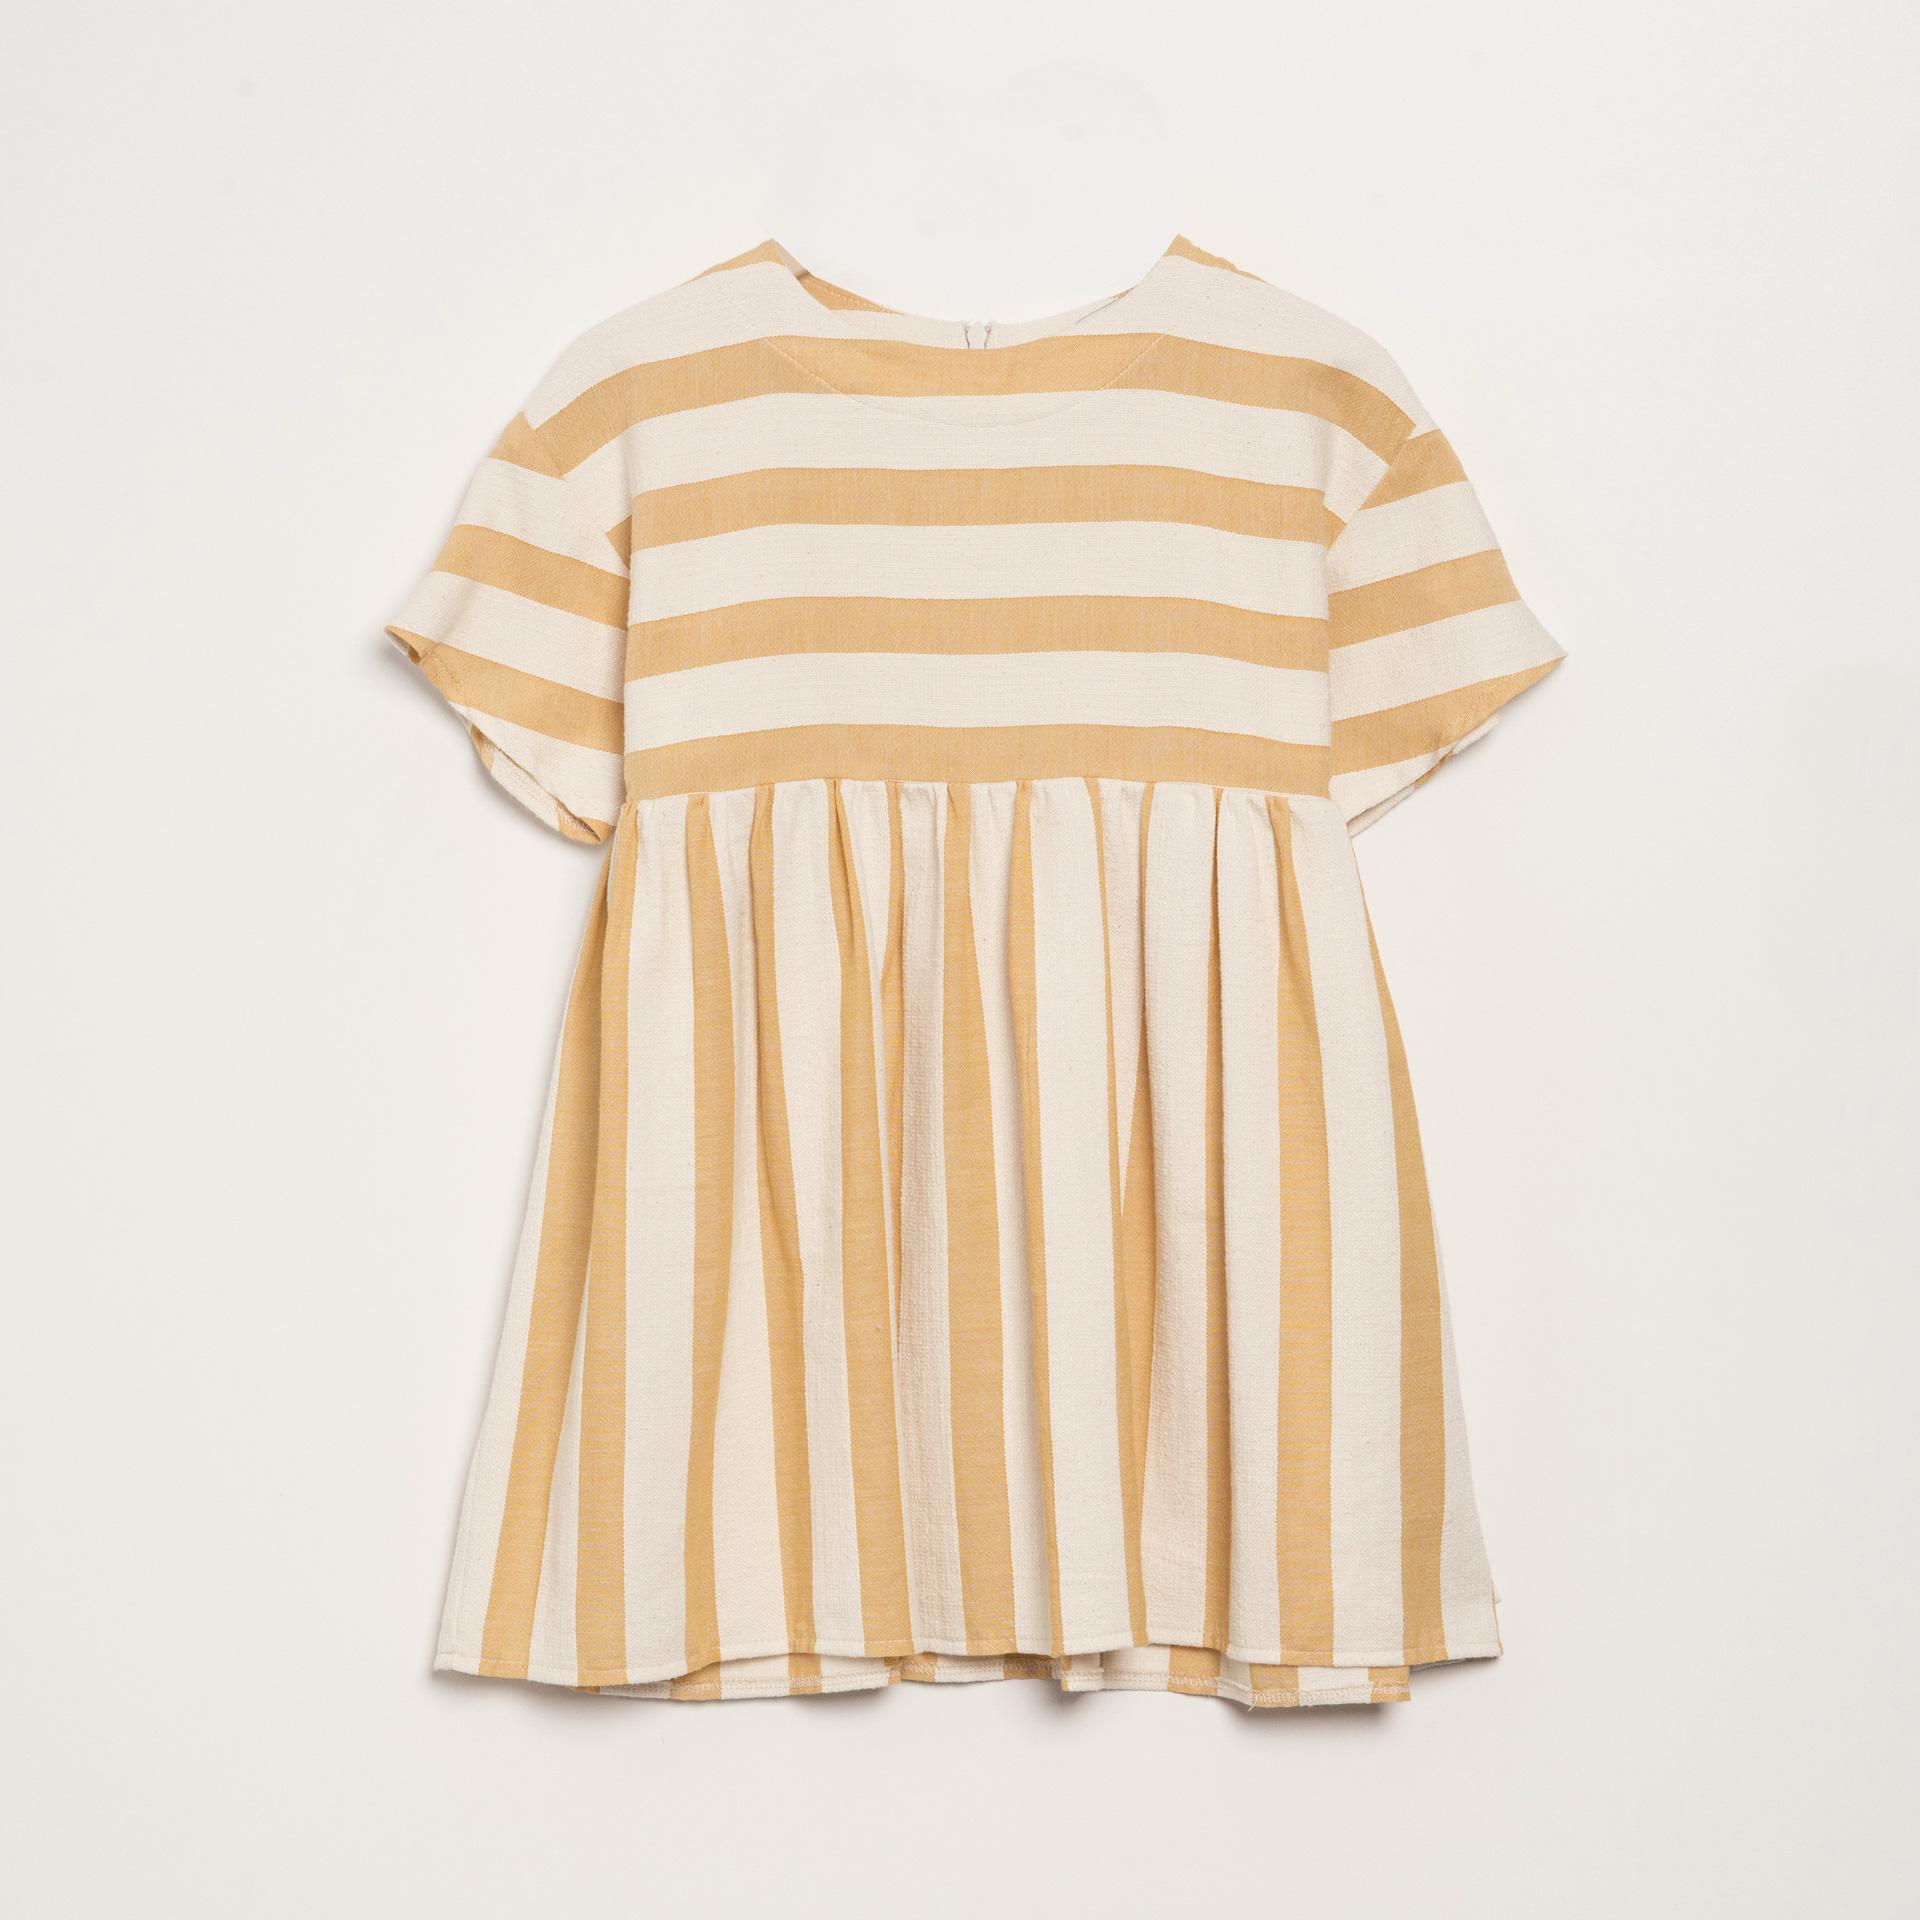 STRIPED YELLOW DRESS